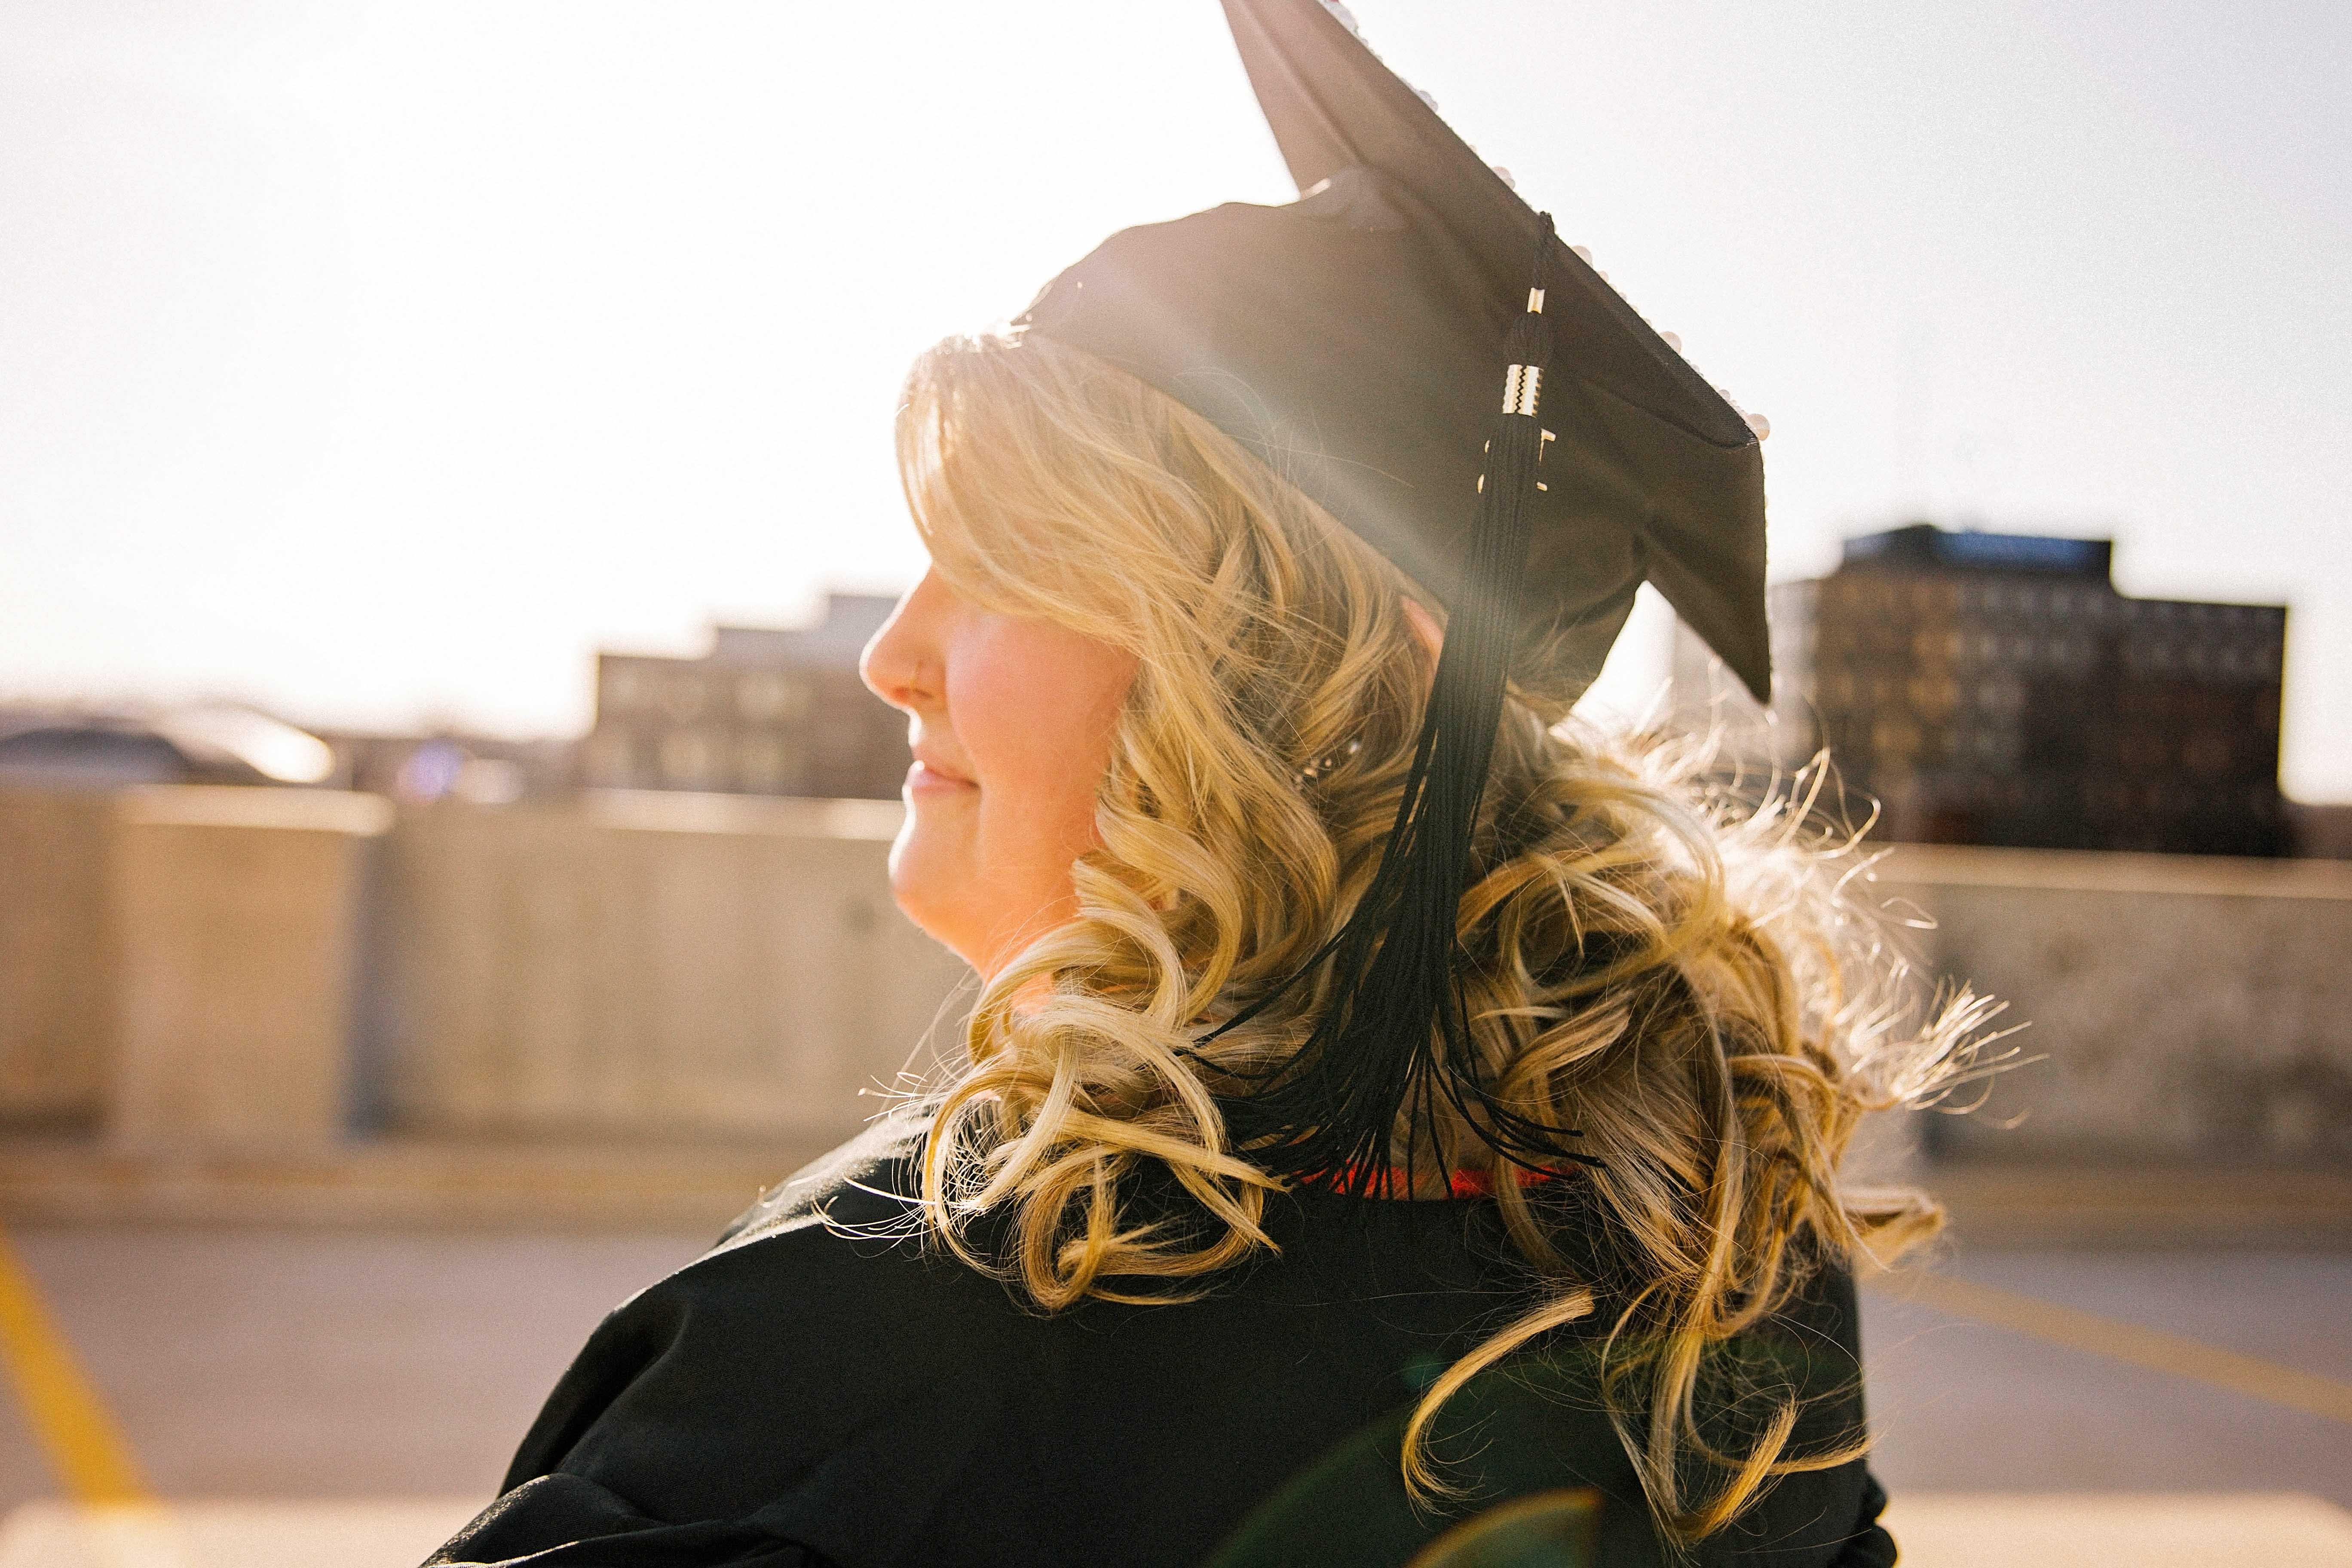 women graduating university, smiling